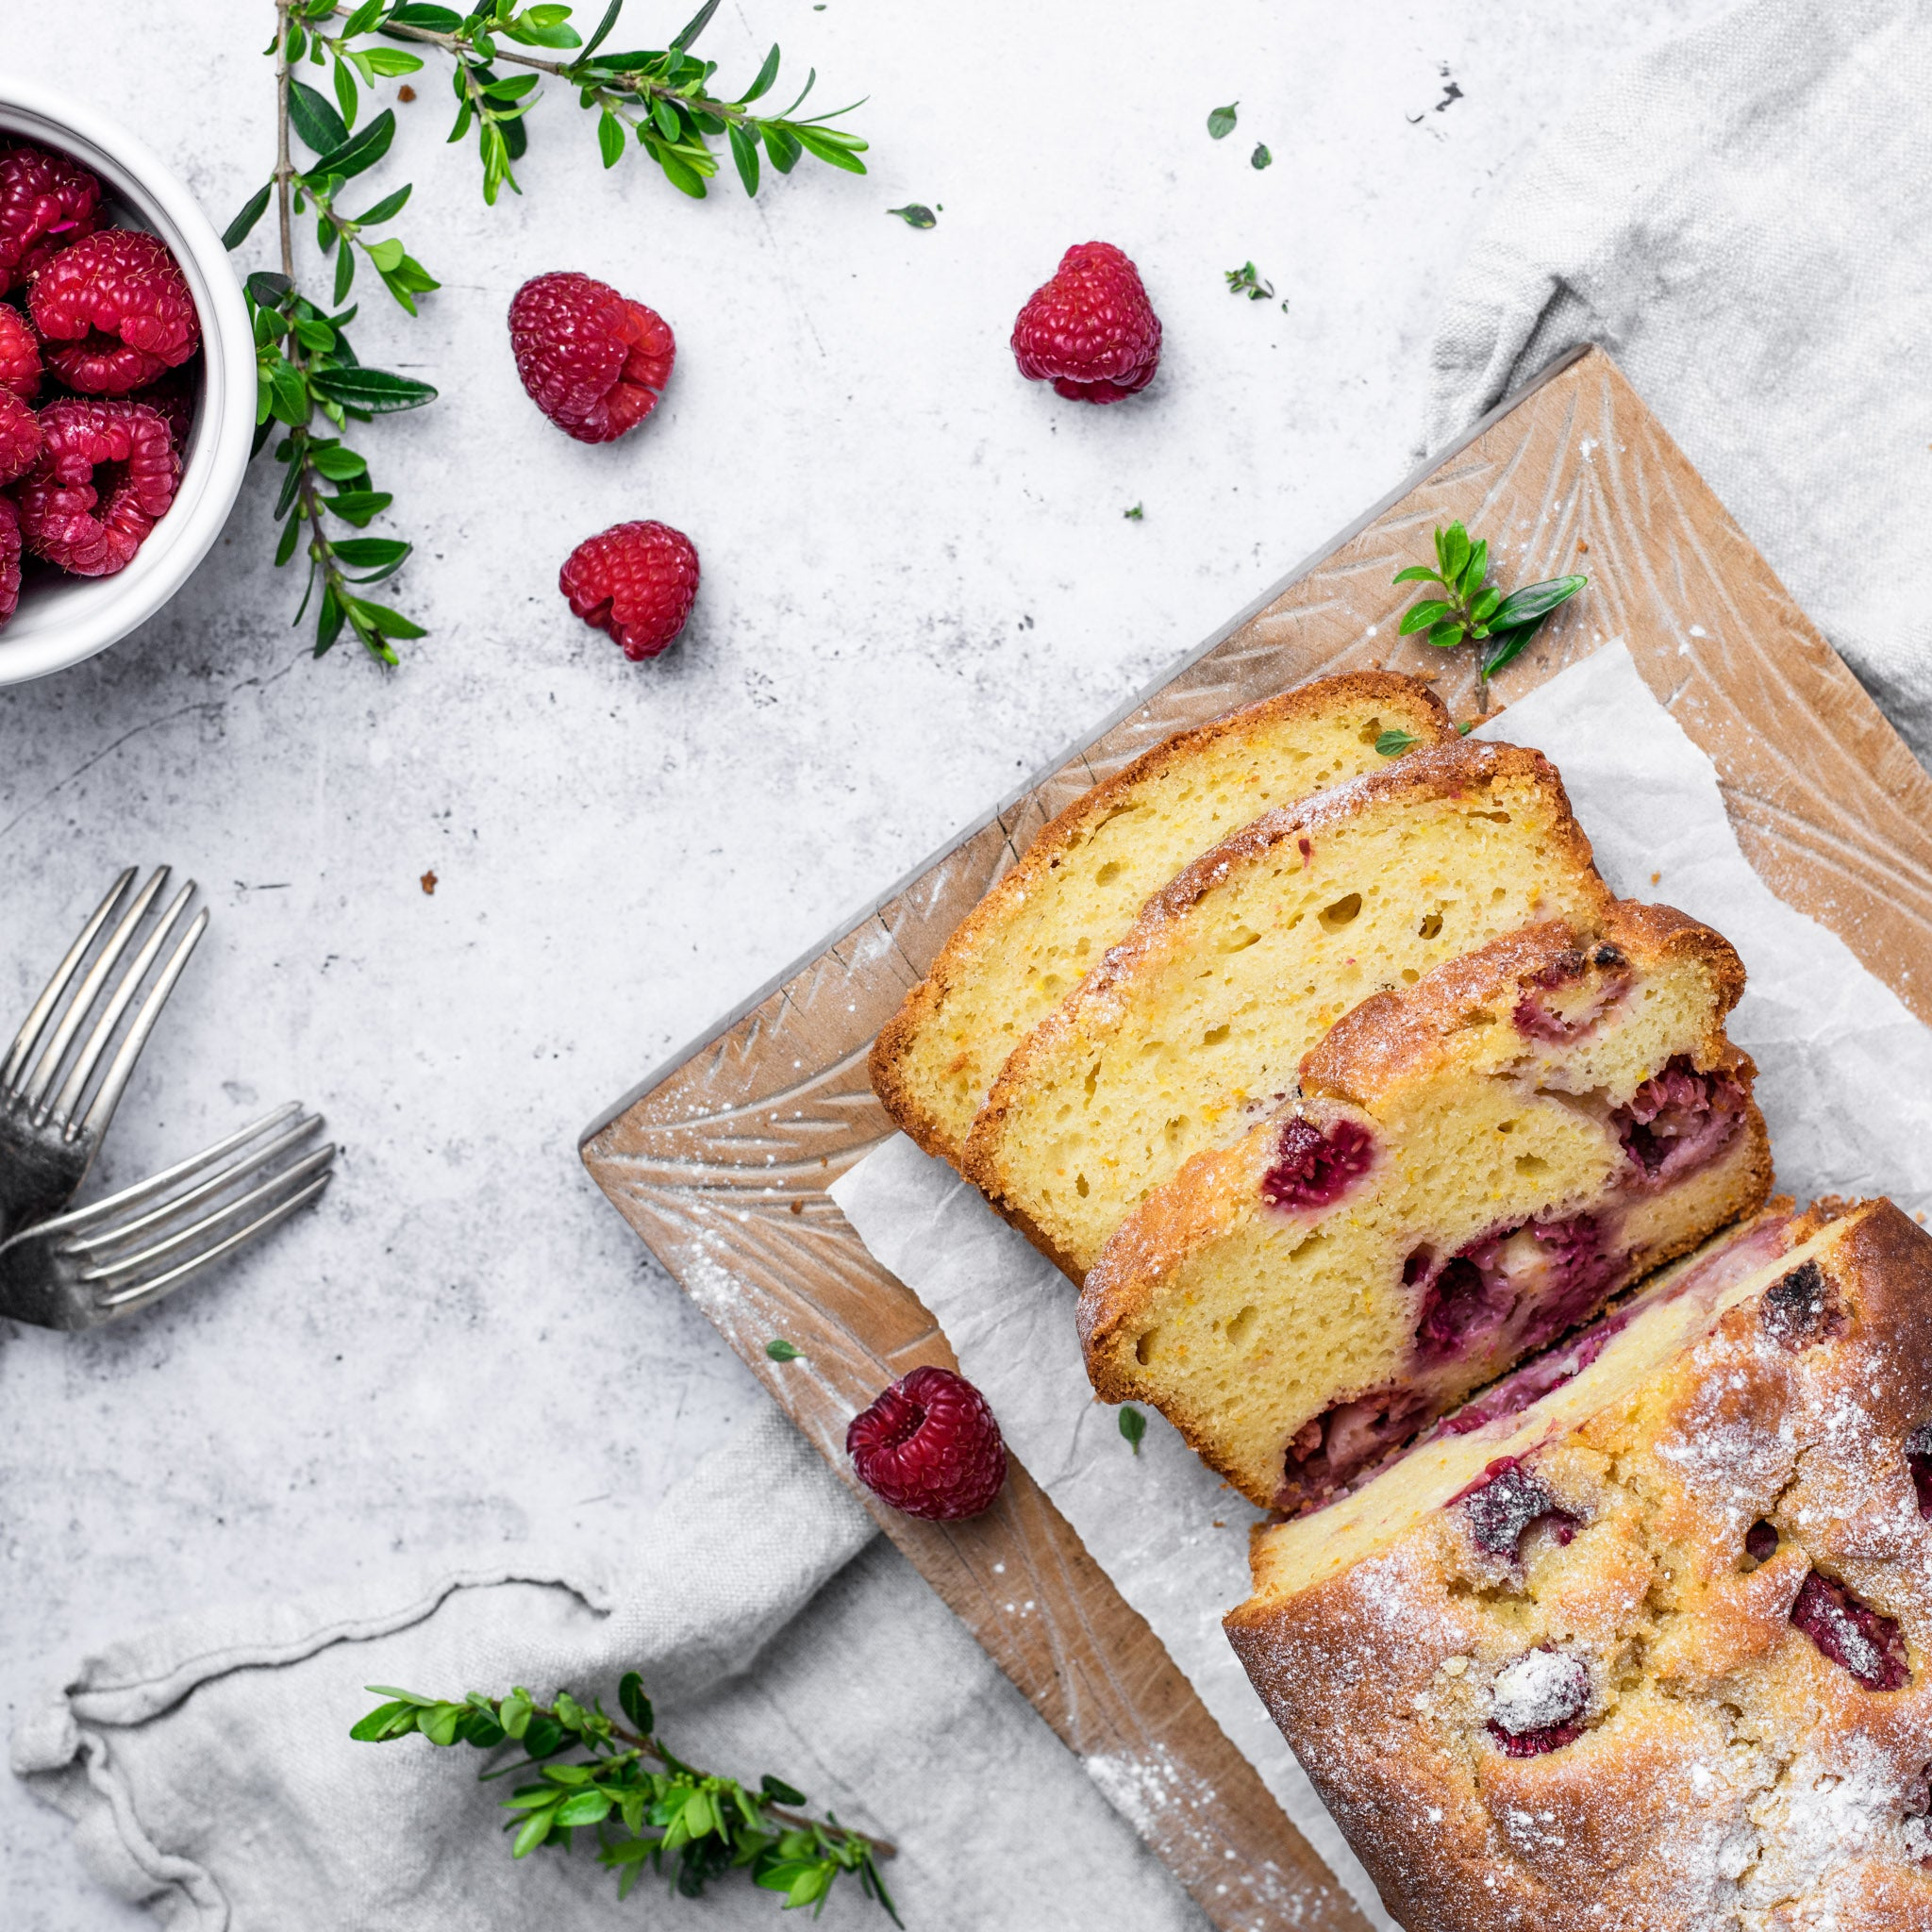 Allinsons-Orange-Raspberry-Loaf-Cake-1-1-Baking-Mad-6.jpg